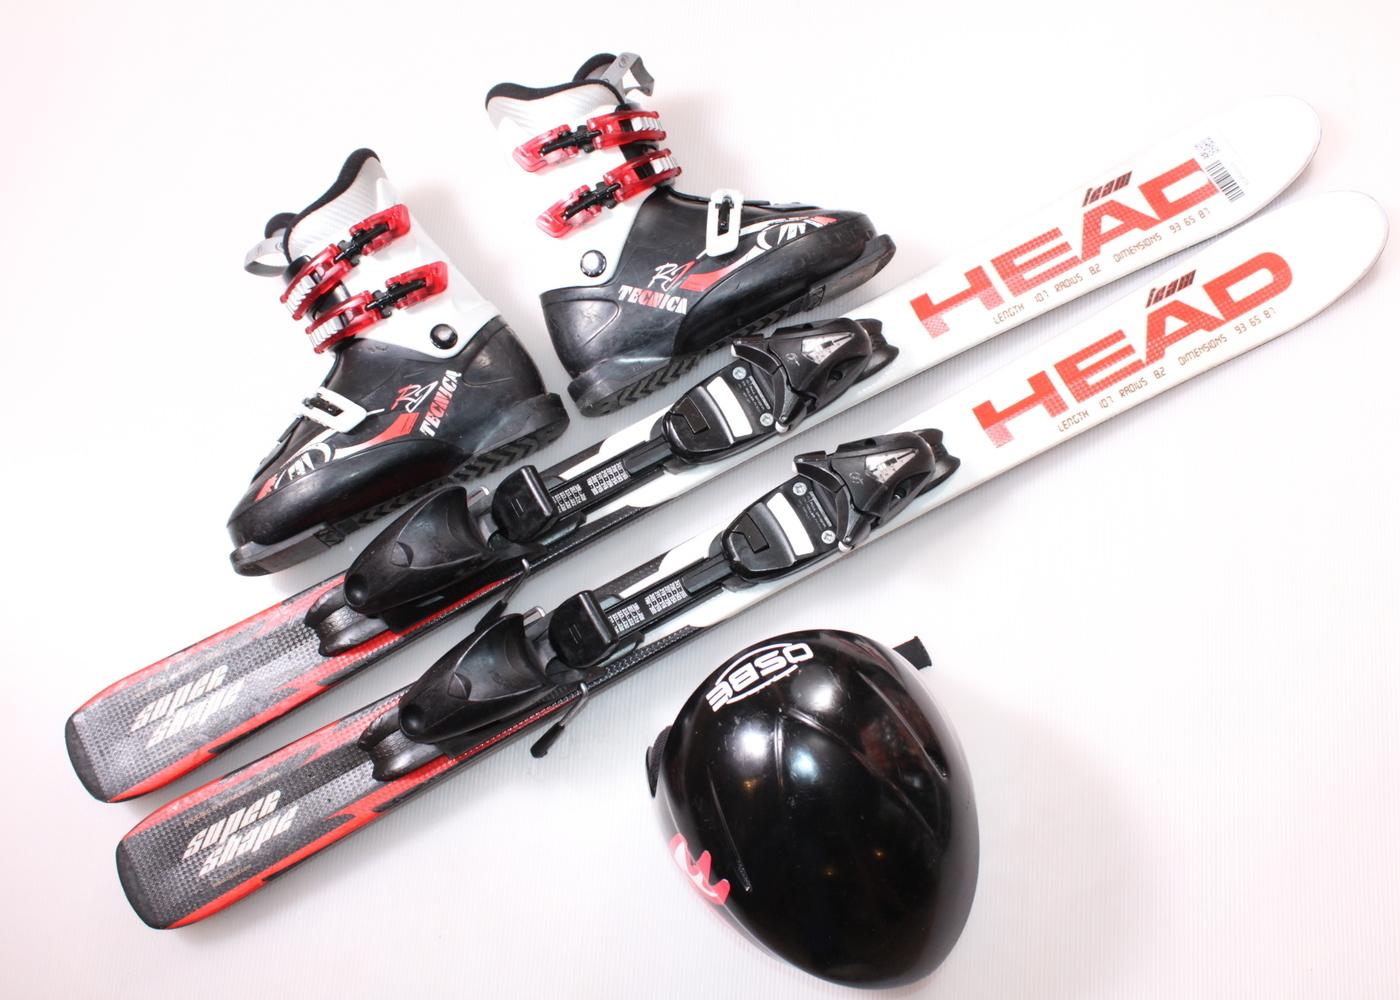 Dětské lyže HEAD SUPERSHAPE TEAM 107 cm + lyžáky  35EU + helma